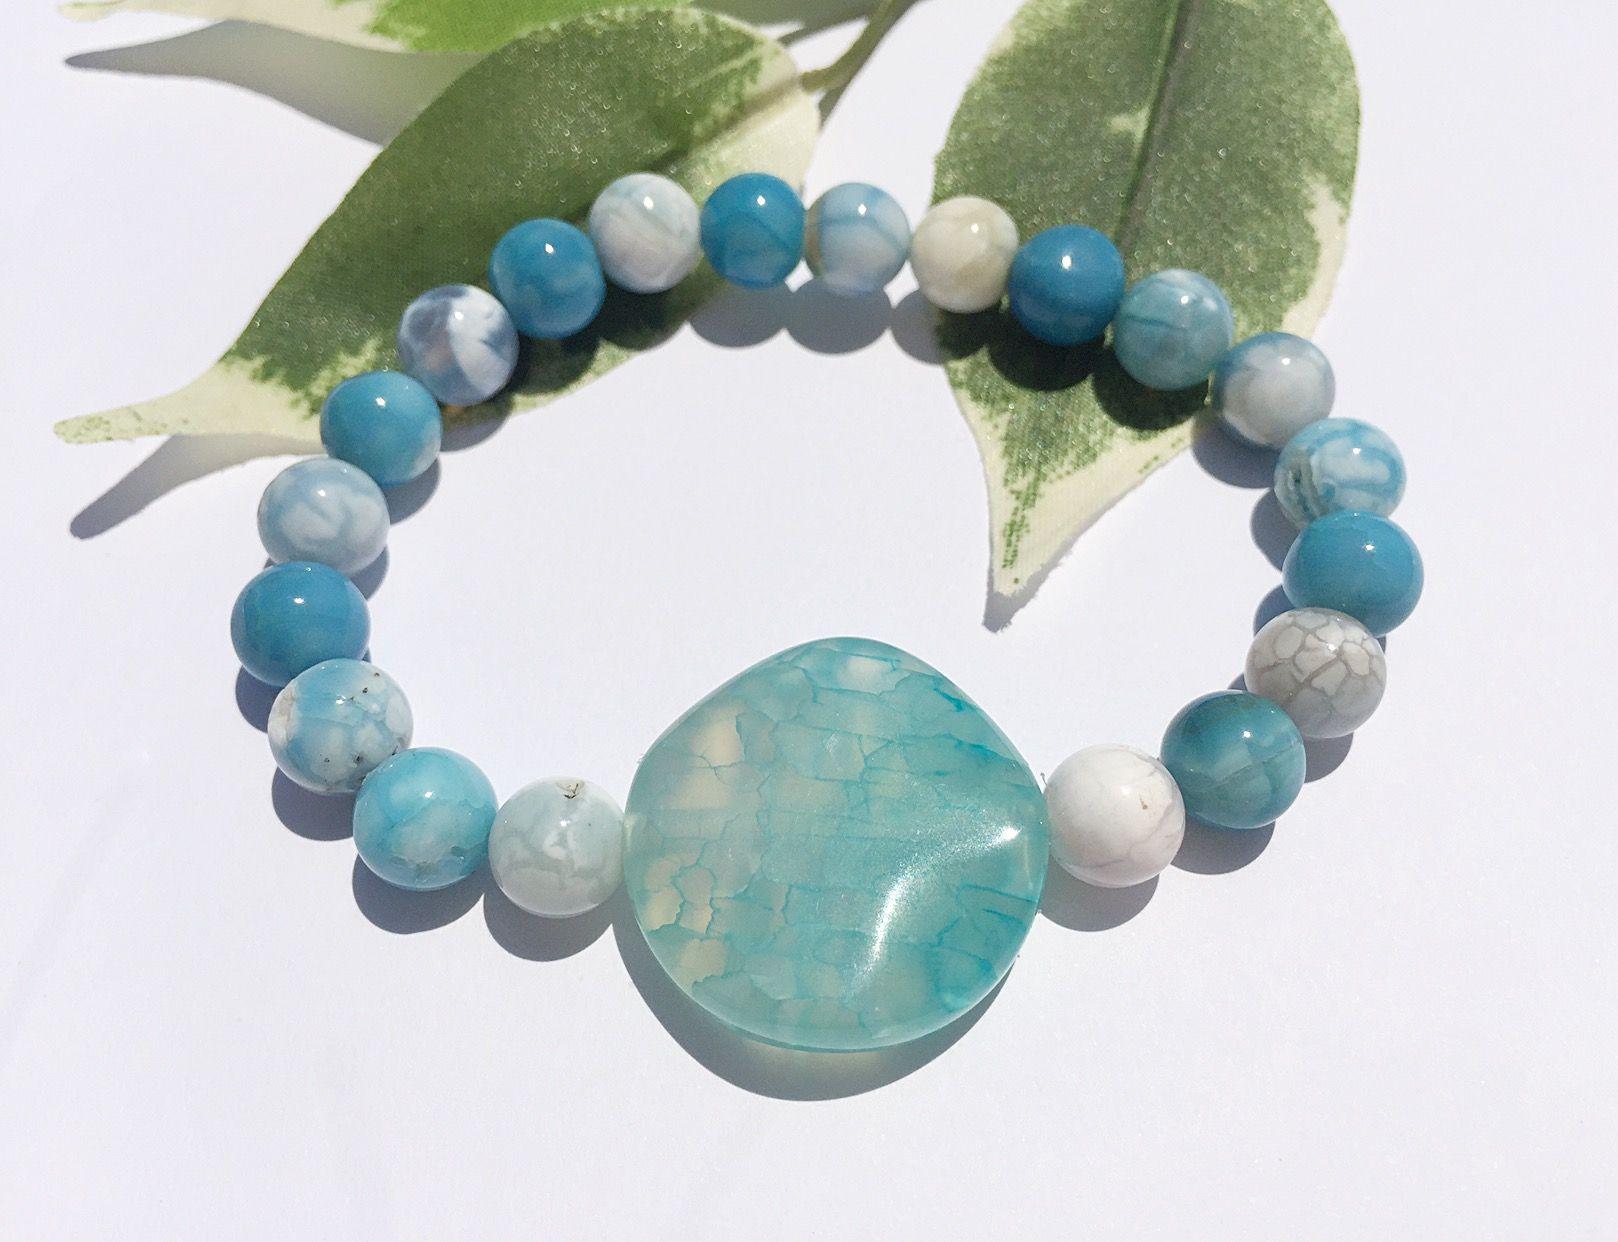 Gemstone Bracelet Turquoise and Agate